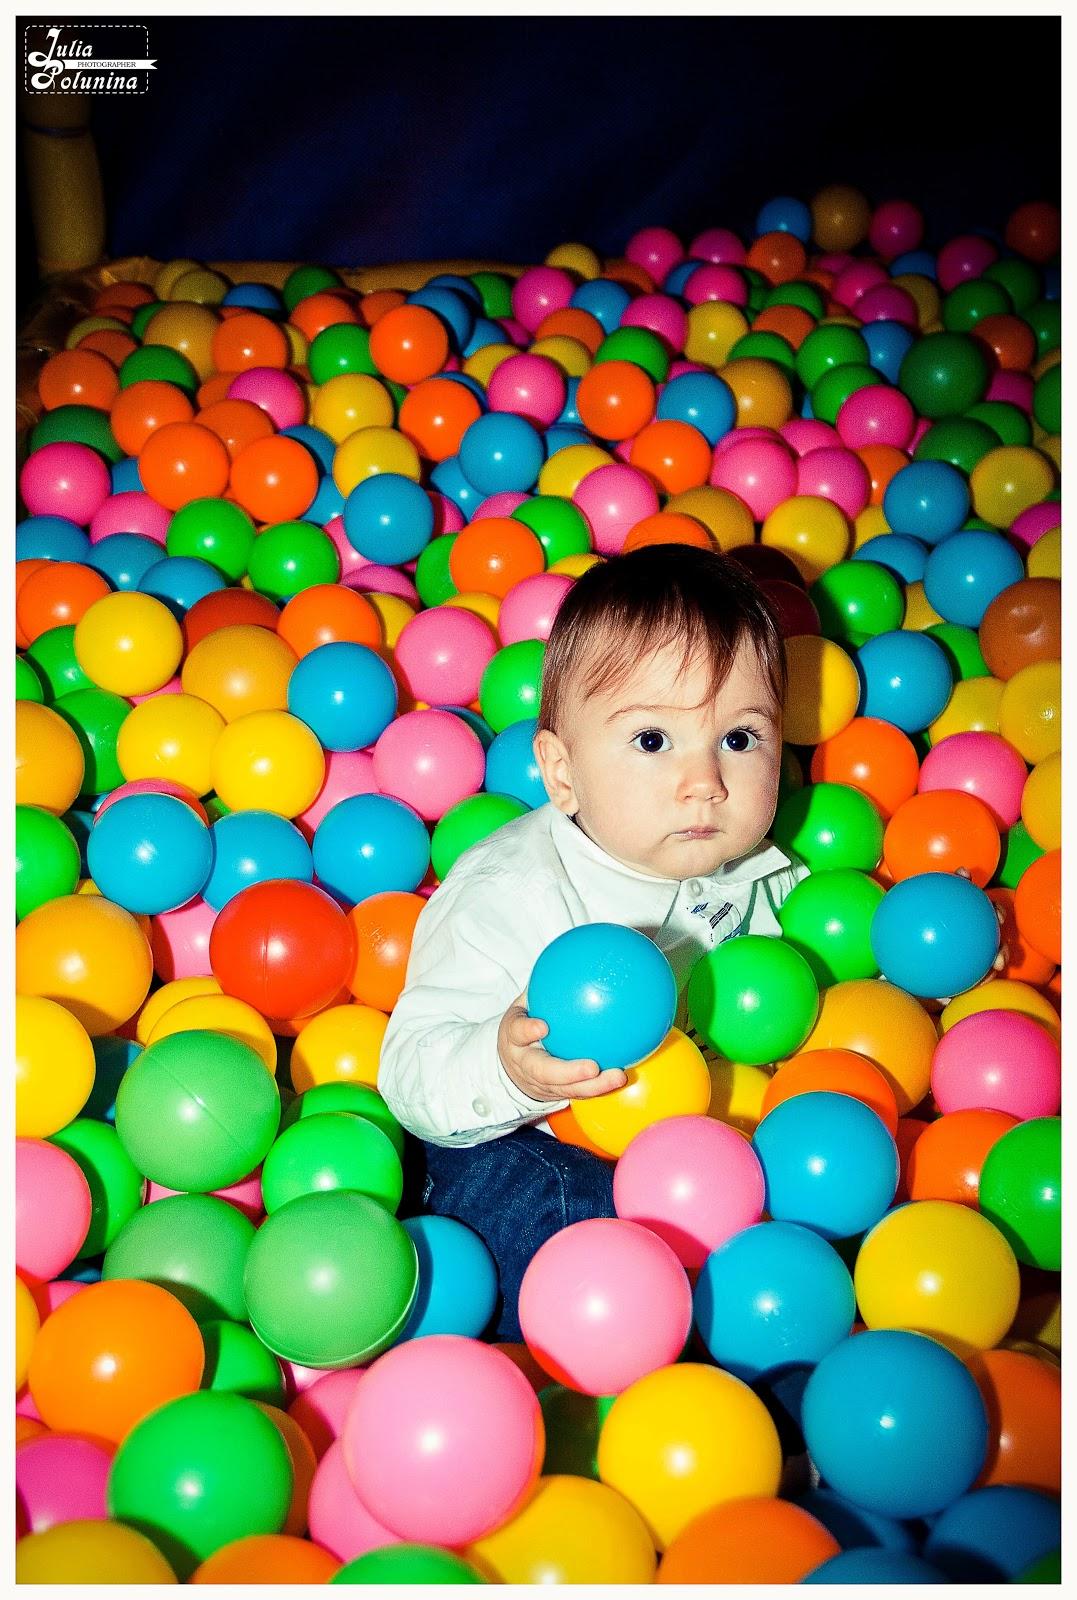 Фото история рождения ребенка